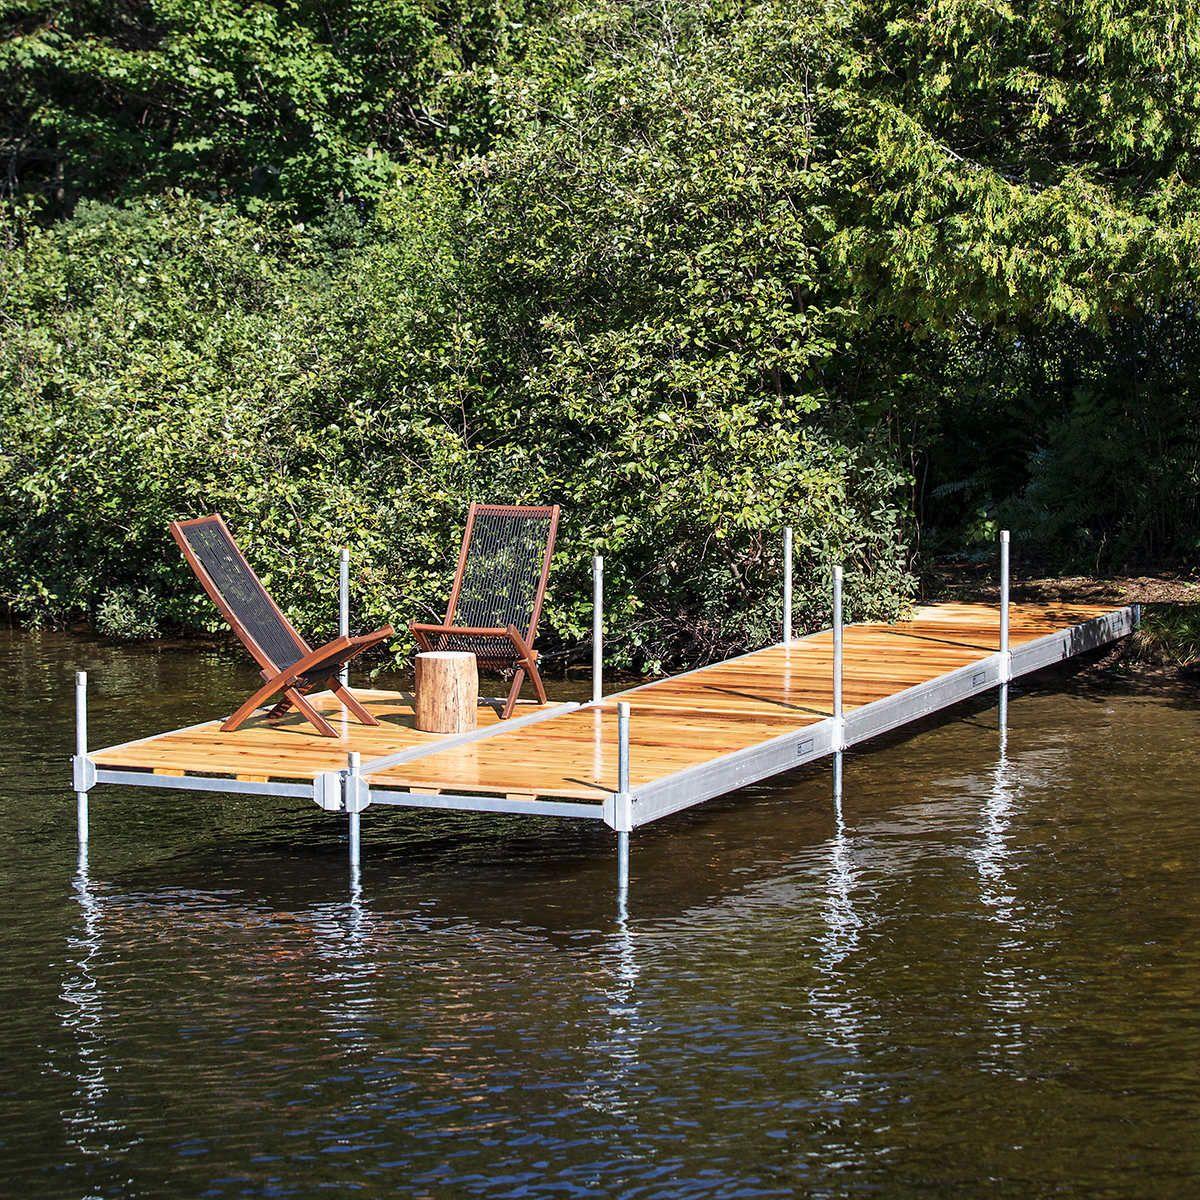 Multinautic 4 ft. x 8 ft. Aluminum Dock Kit Do It